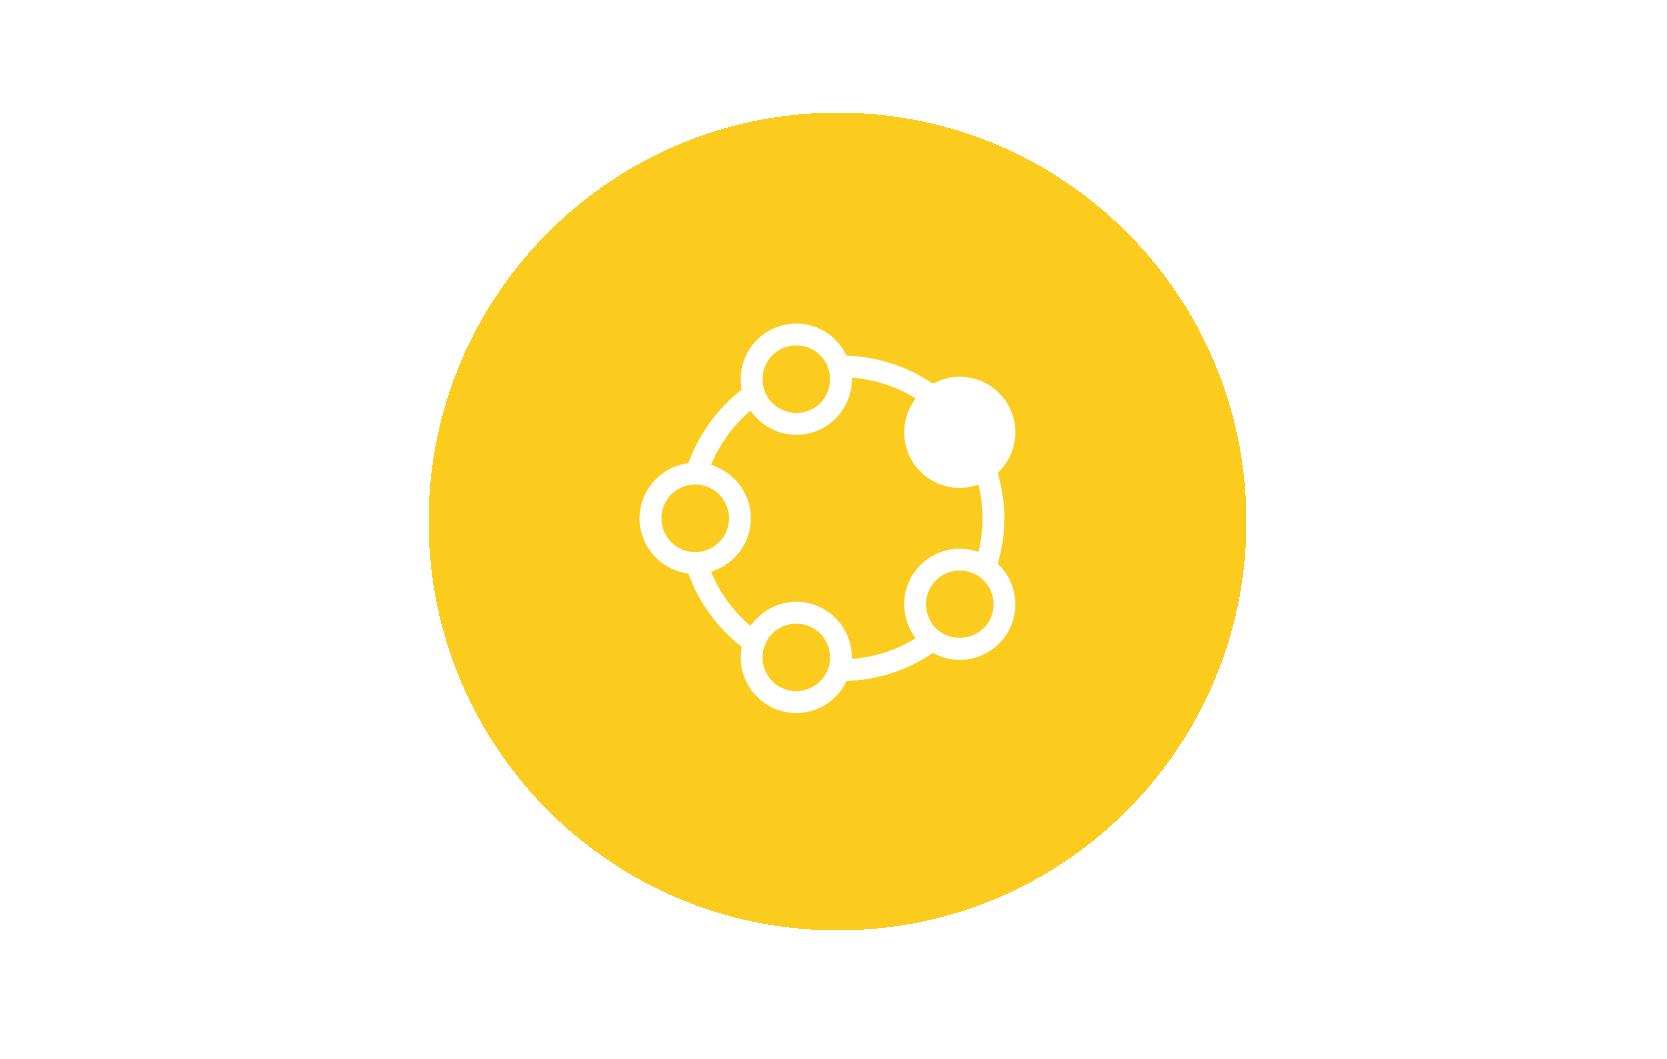 BGP Site Vector Assets-08.png